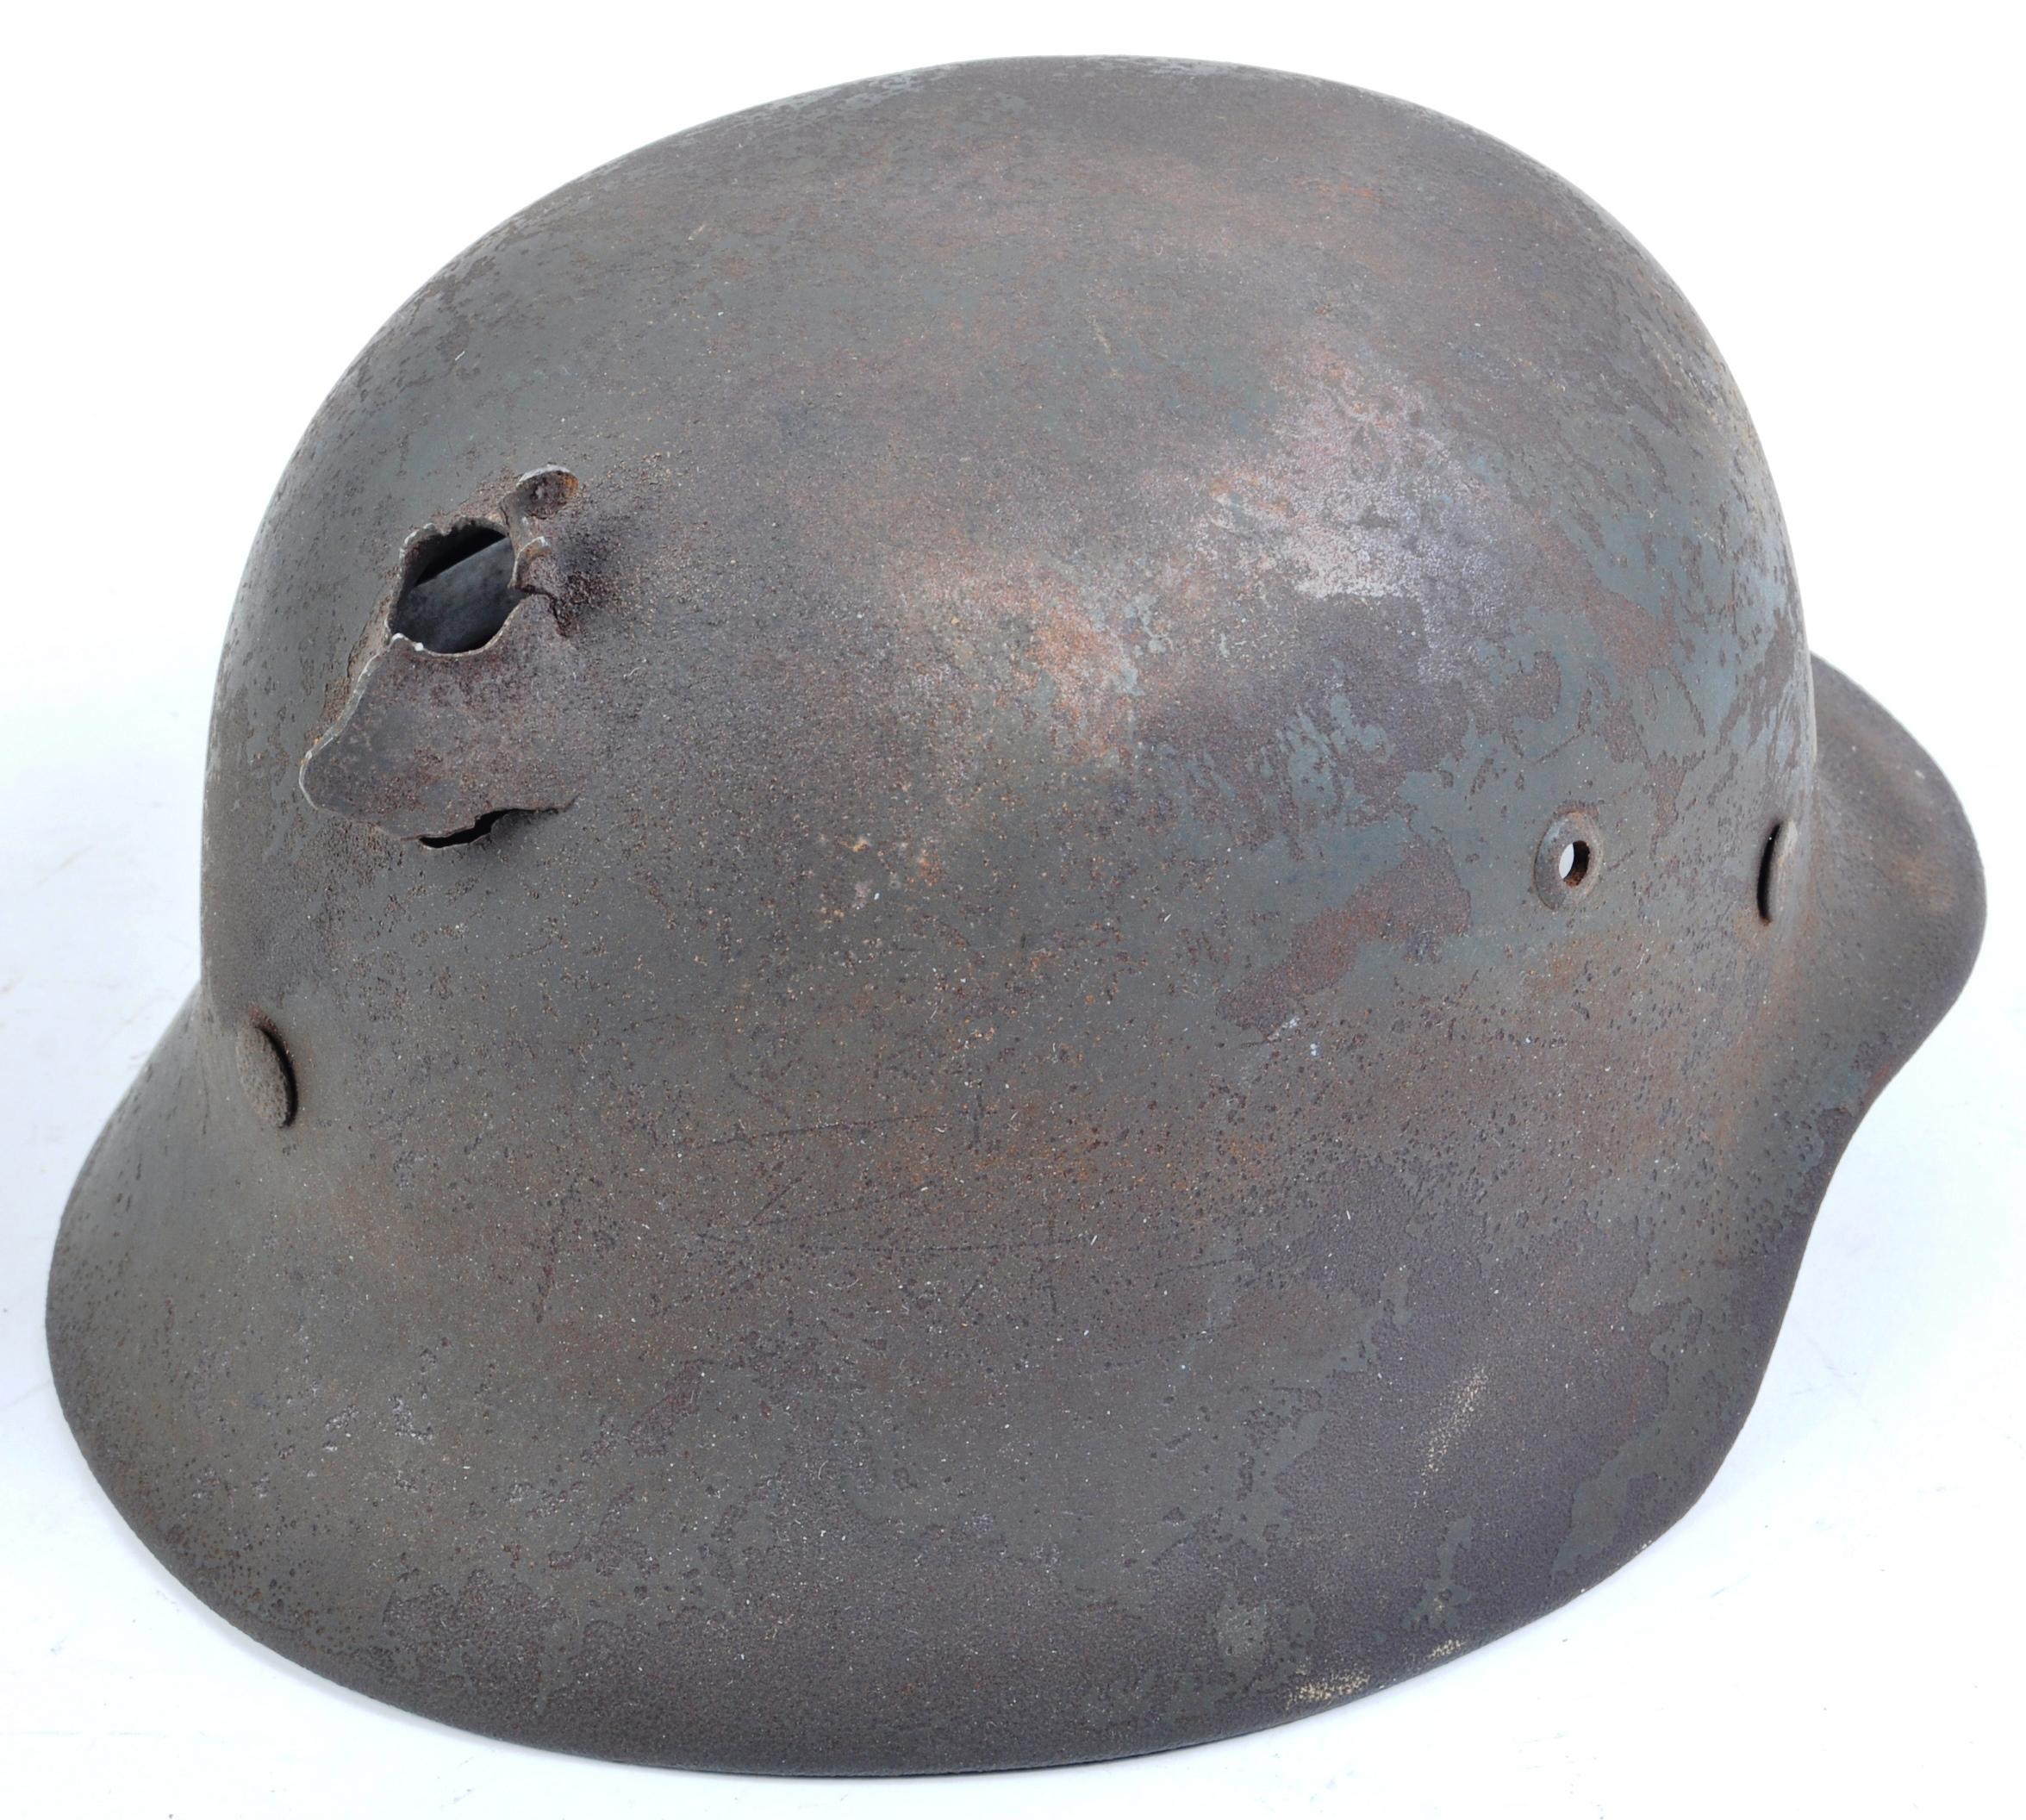 ORIGINAL WWII GERMAN M35 STAHLHELM BATTLE DAMAGED HELMET - Image 2 of 7